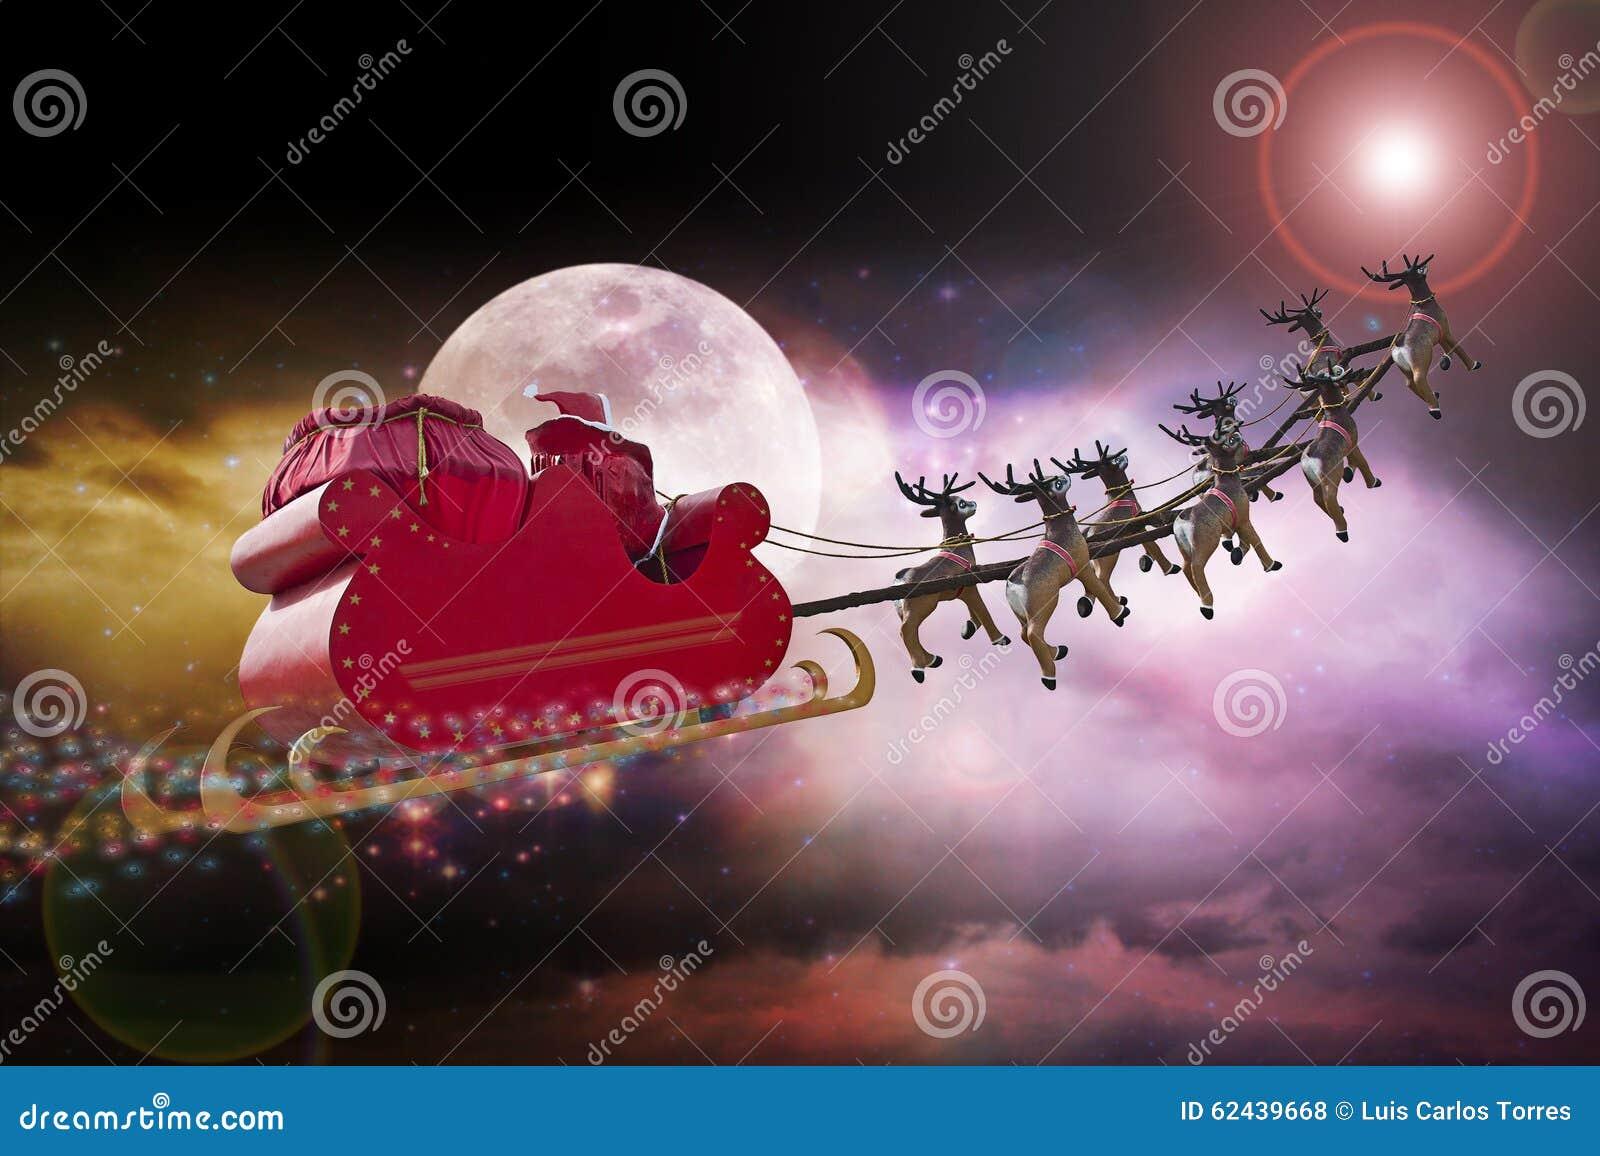 Santa Claus star gps